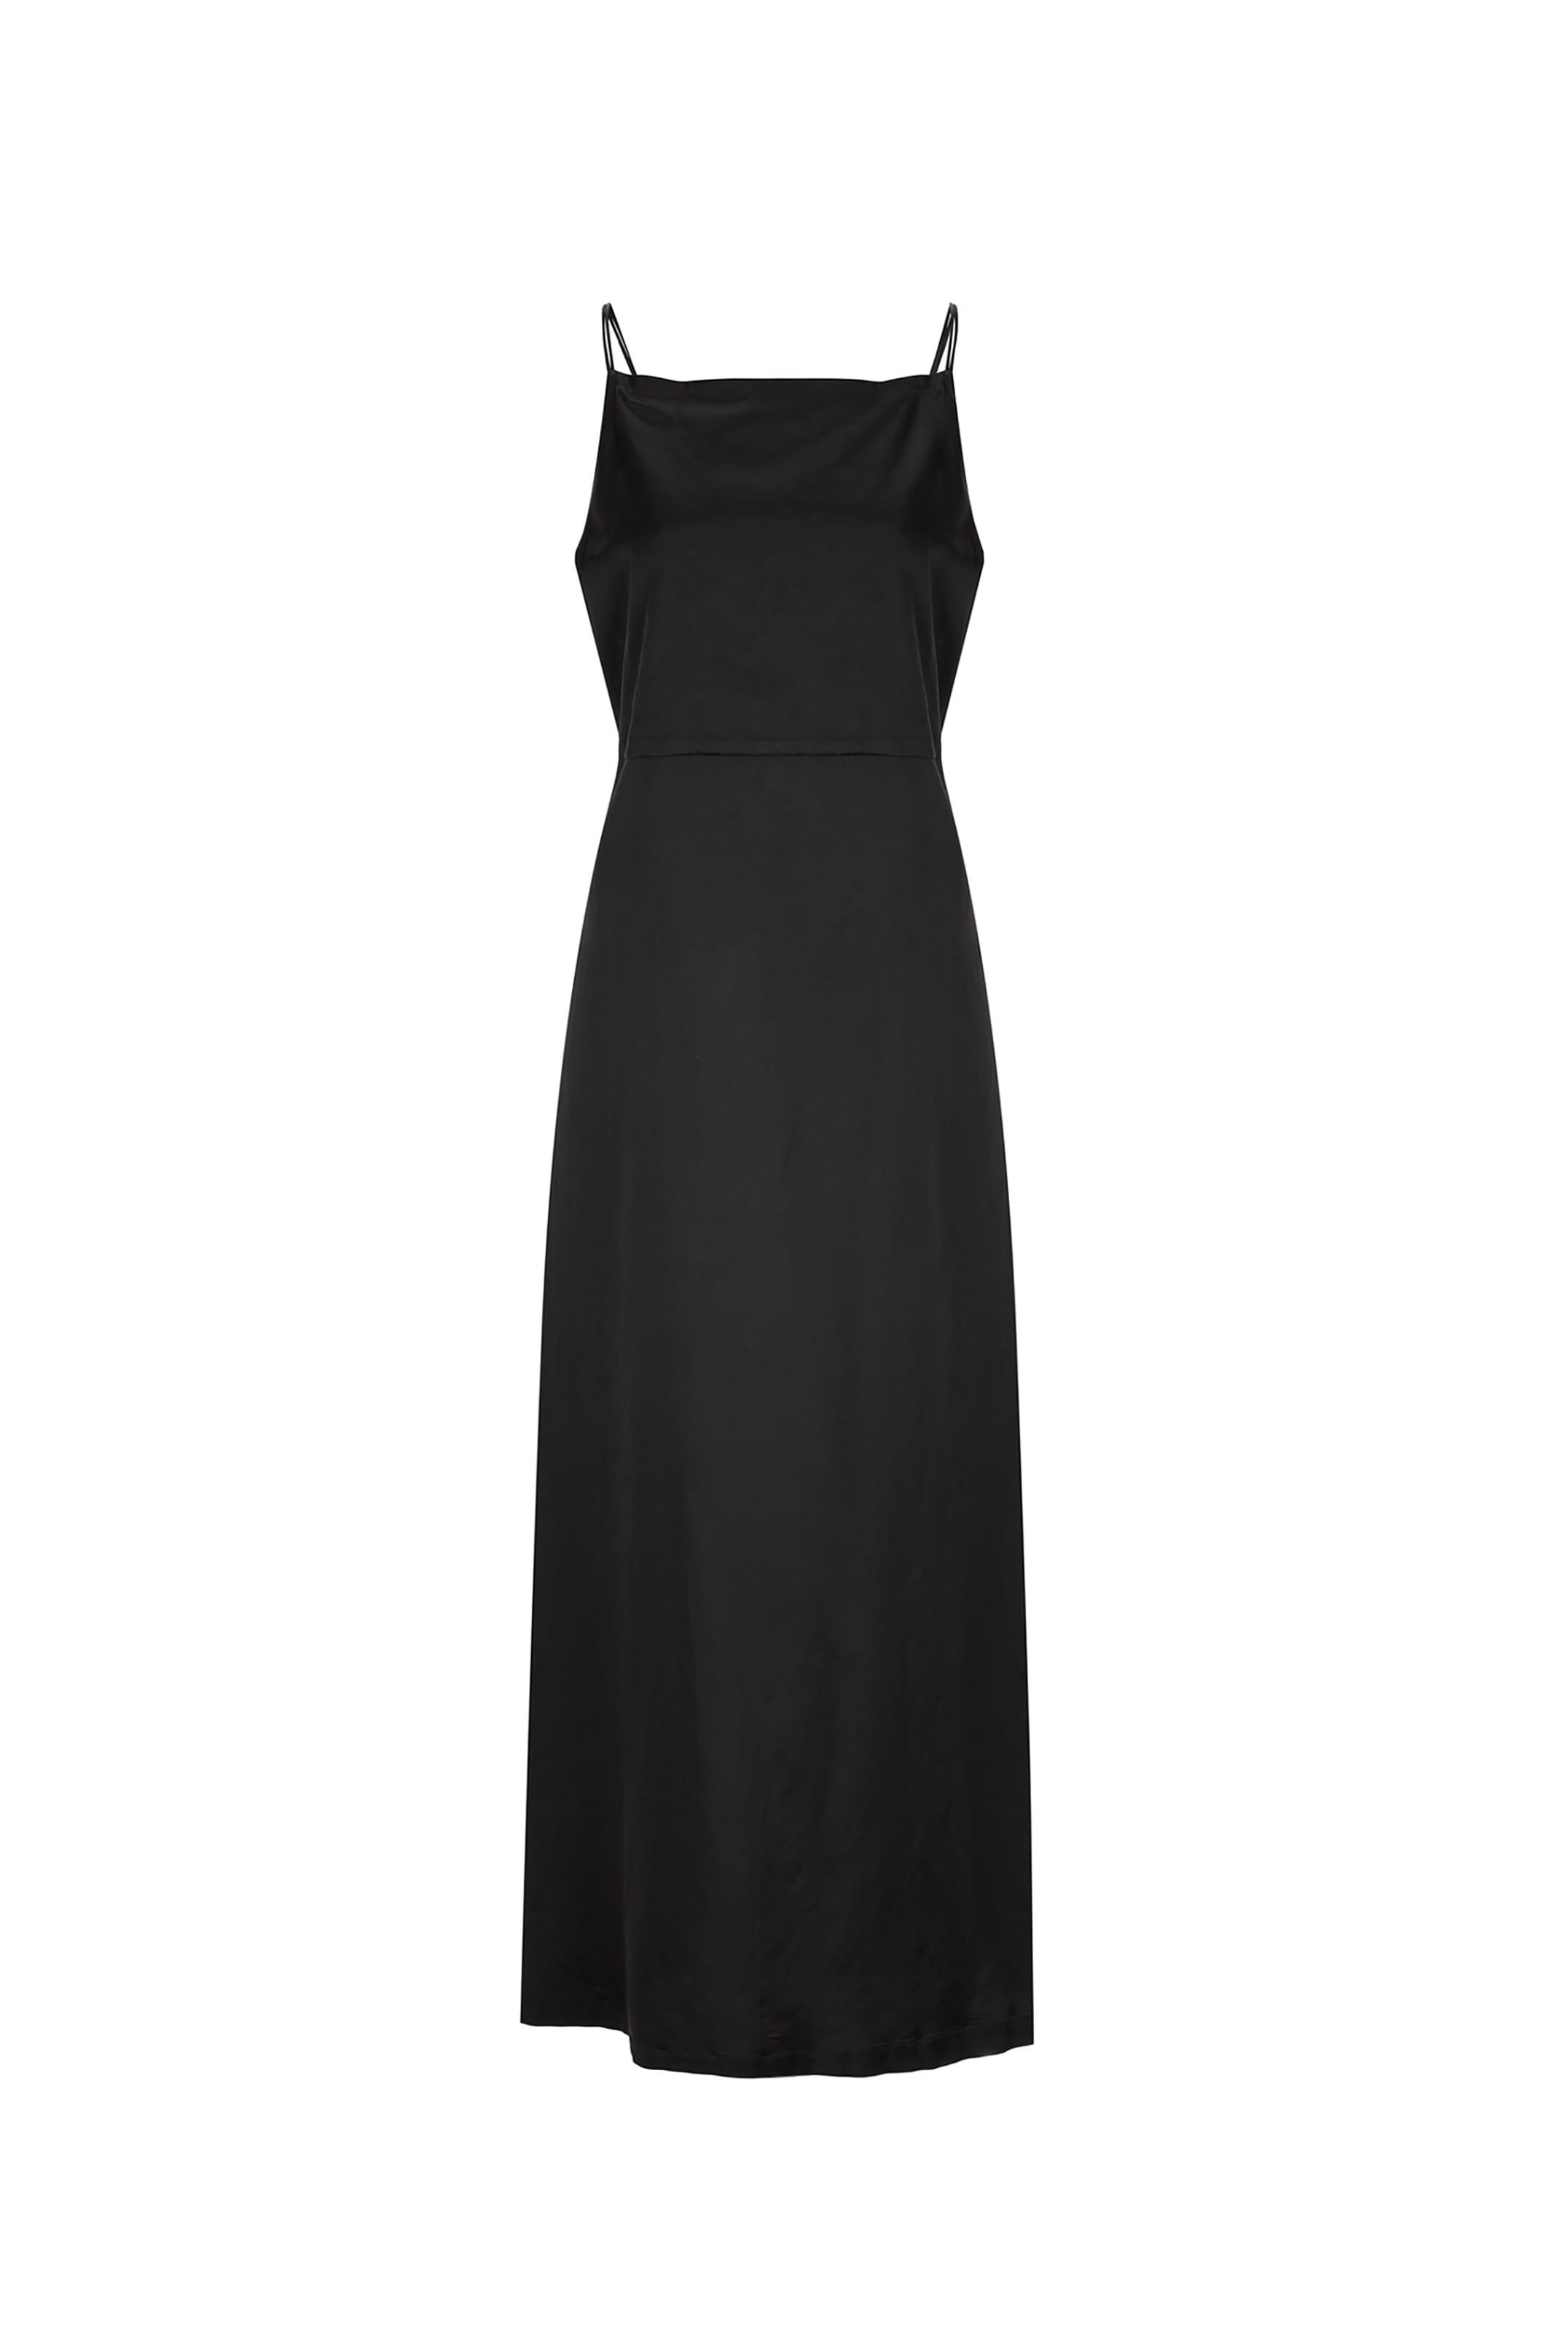 DOUBLE SLIP DRESS_BLACK